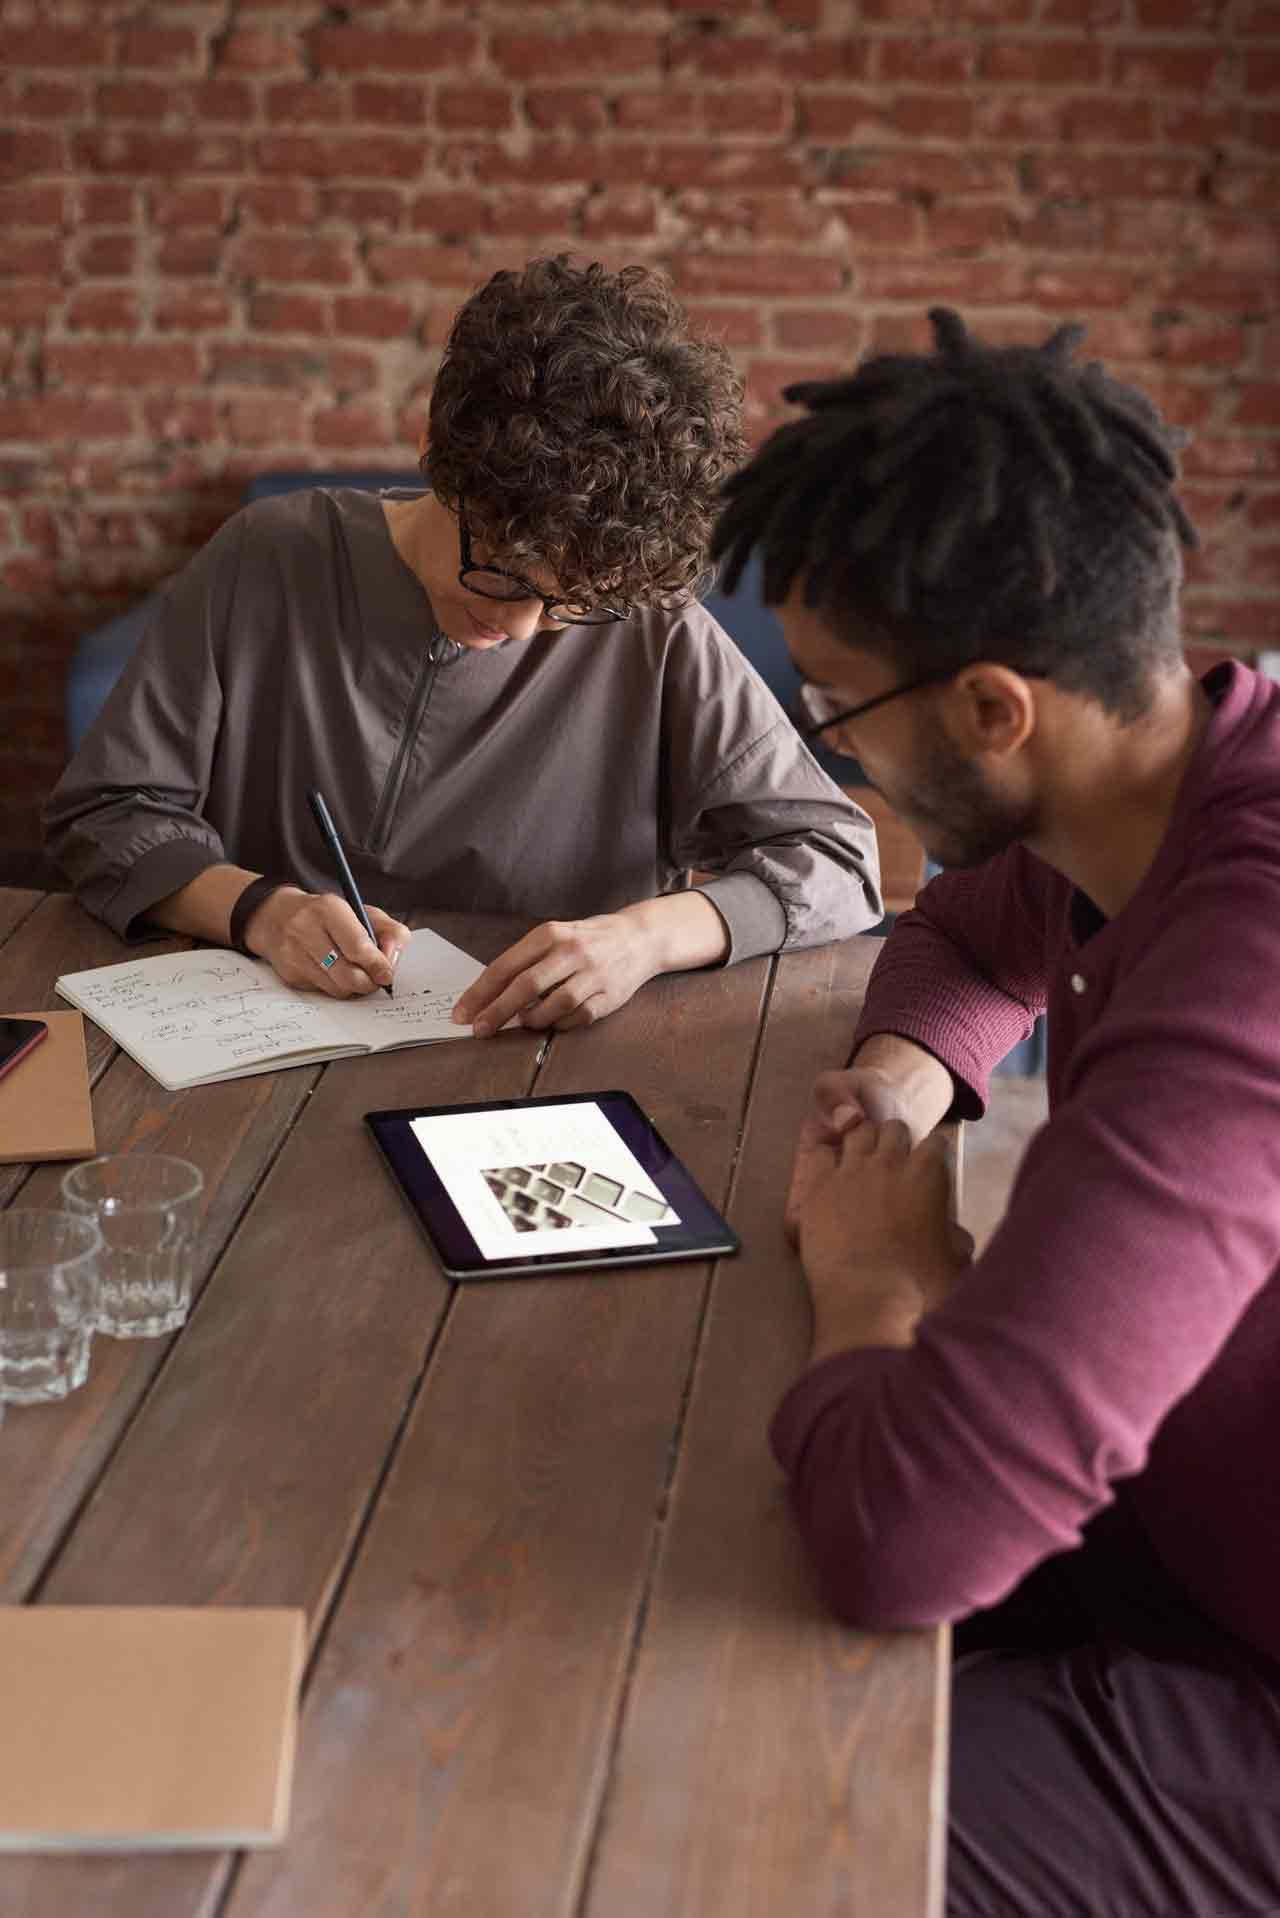 man-wearing-purple-long-sleeved-shirt-looking-at-the-ipad-3184326